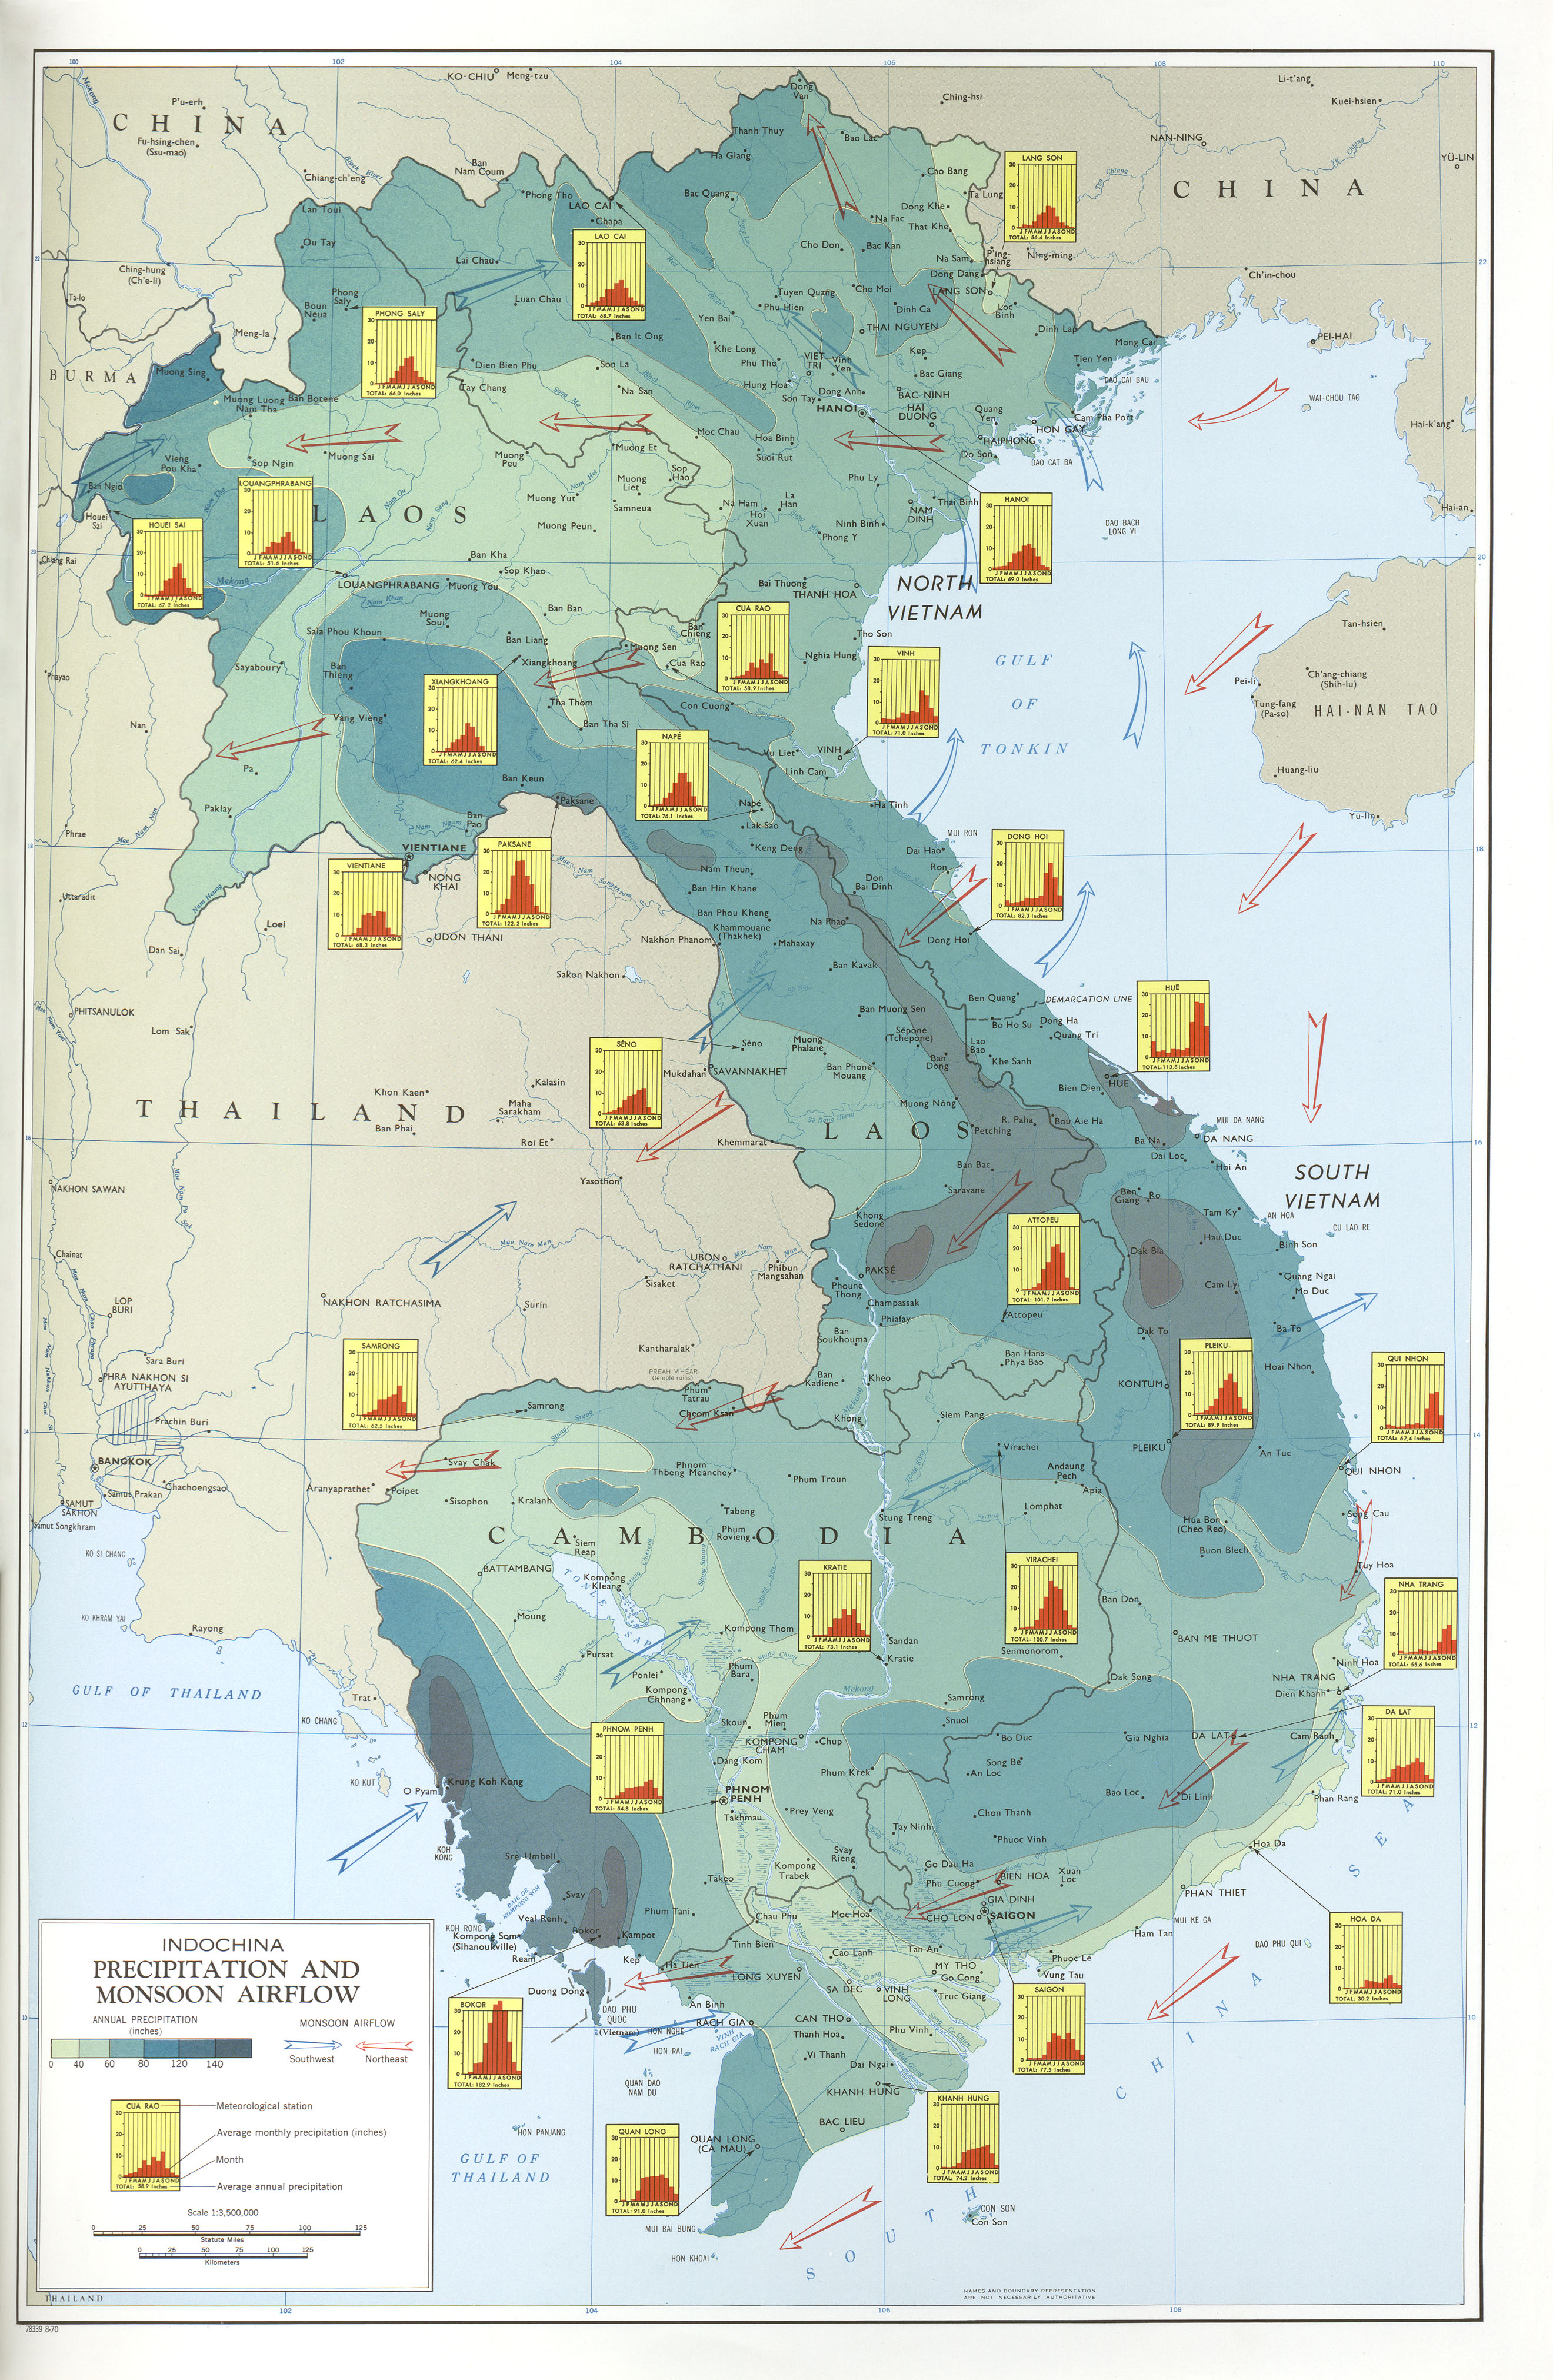 Indochina Atlas PerryCastañeda Map Collection UT Library Online - Online atlas